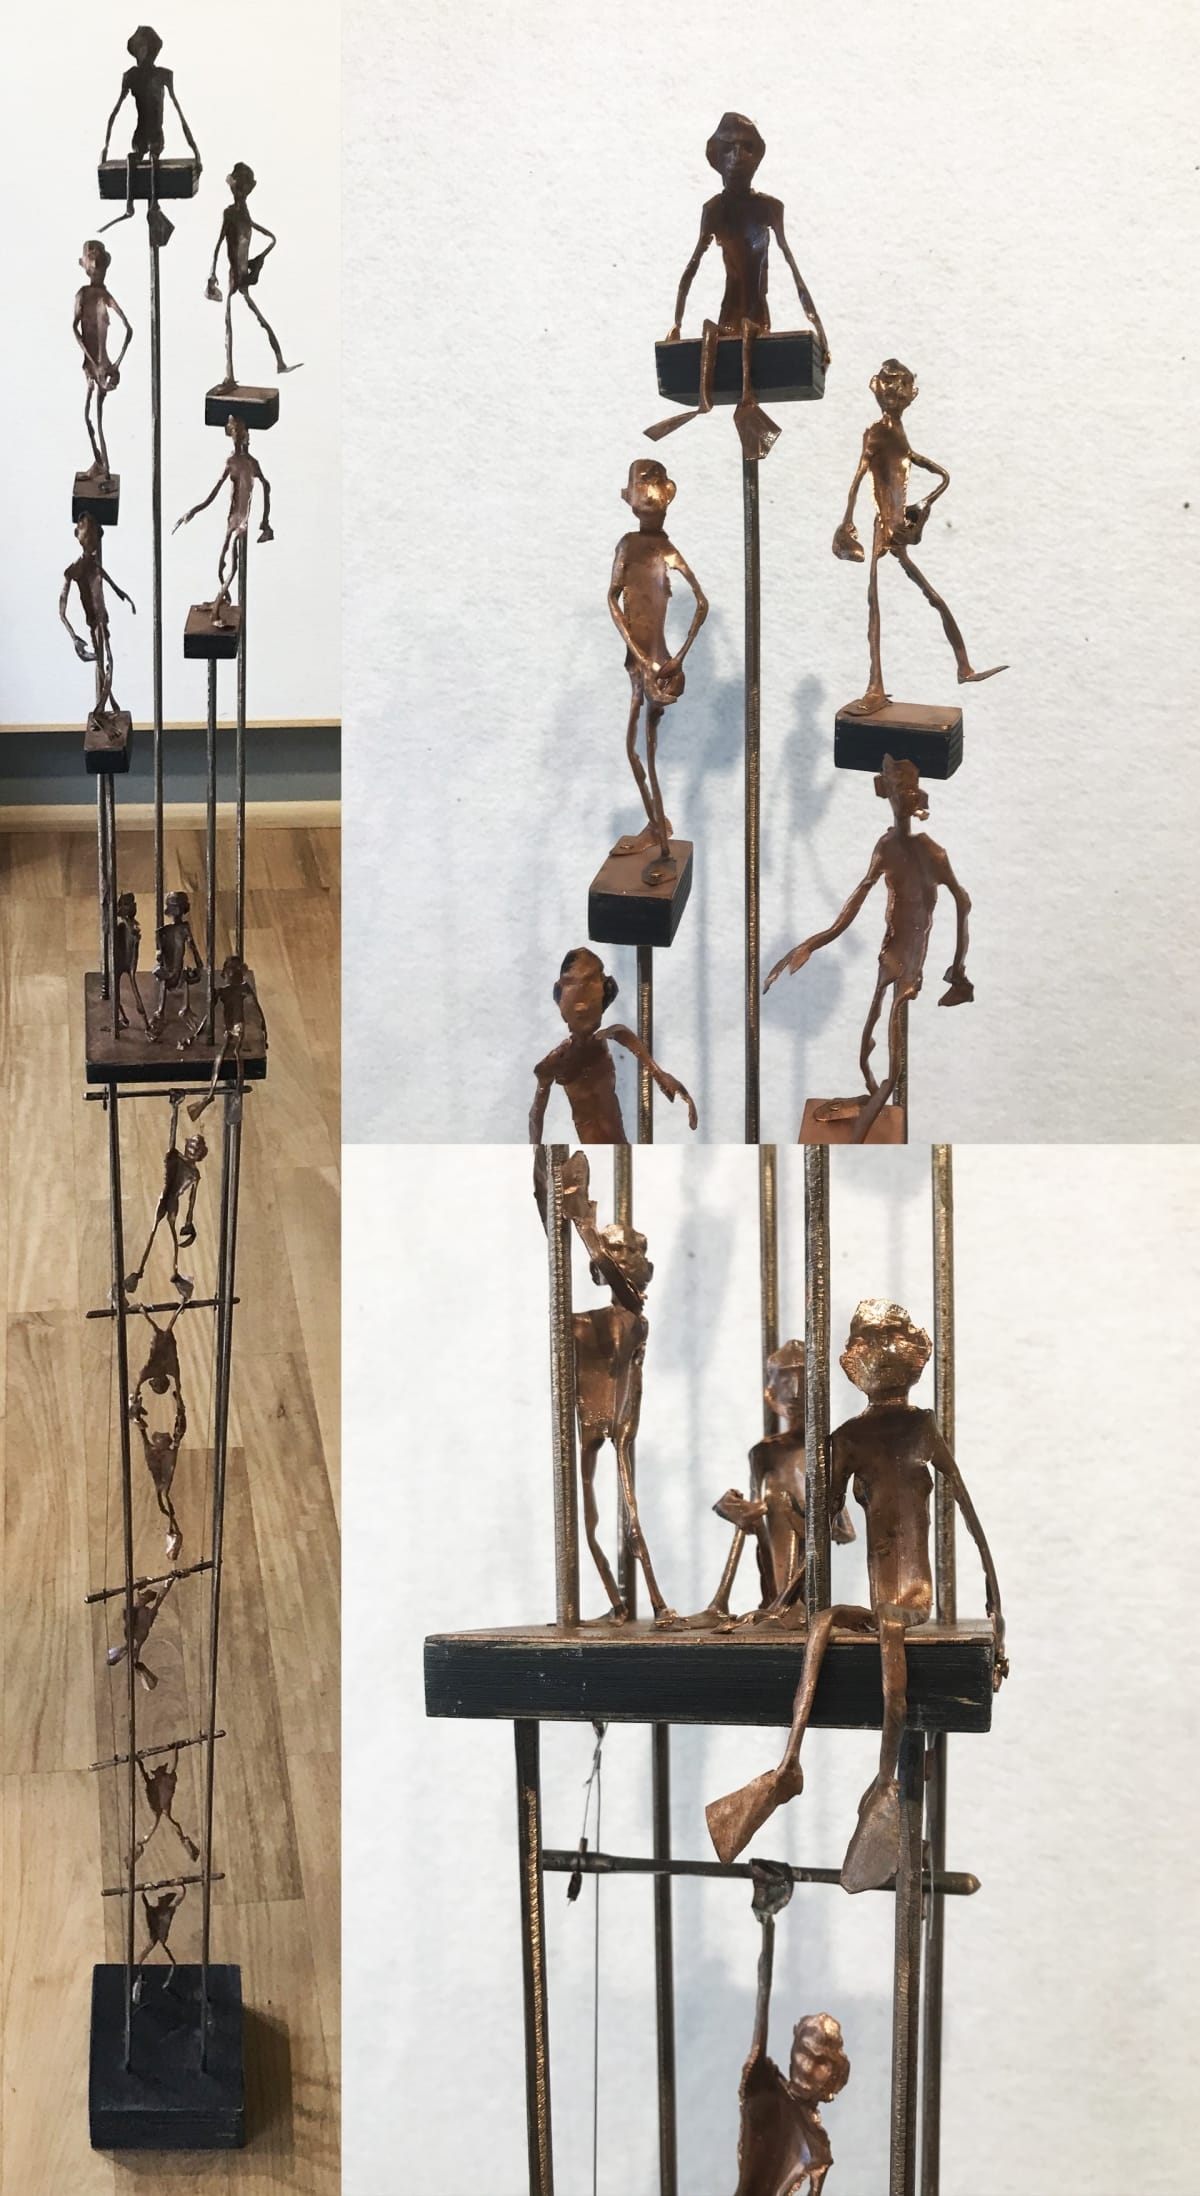 acrobati ebbri